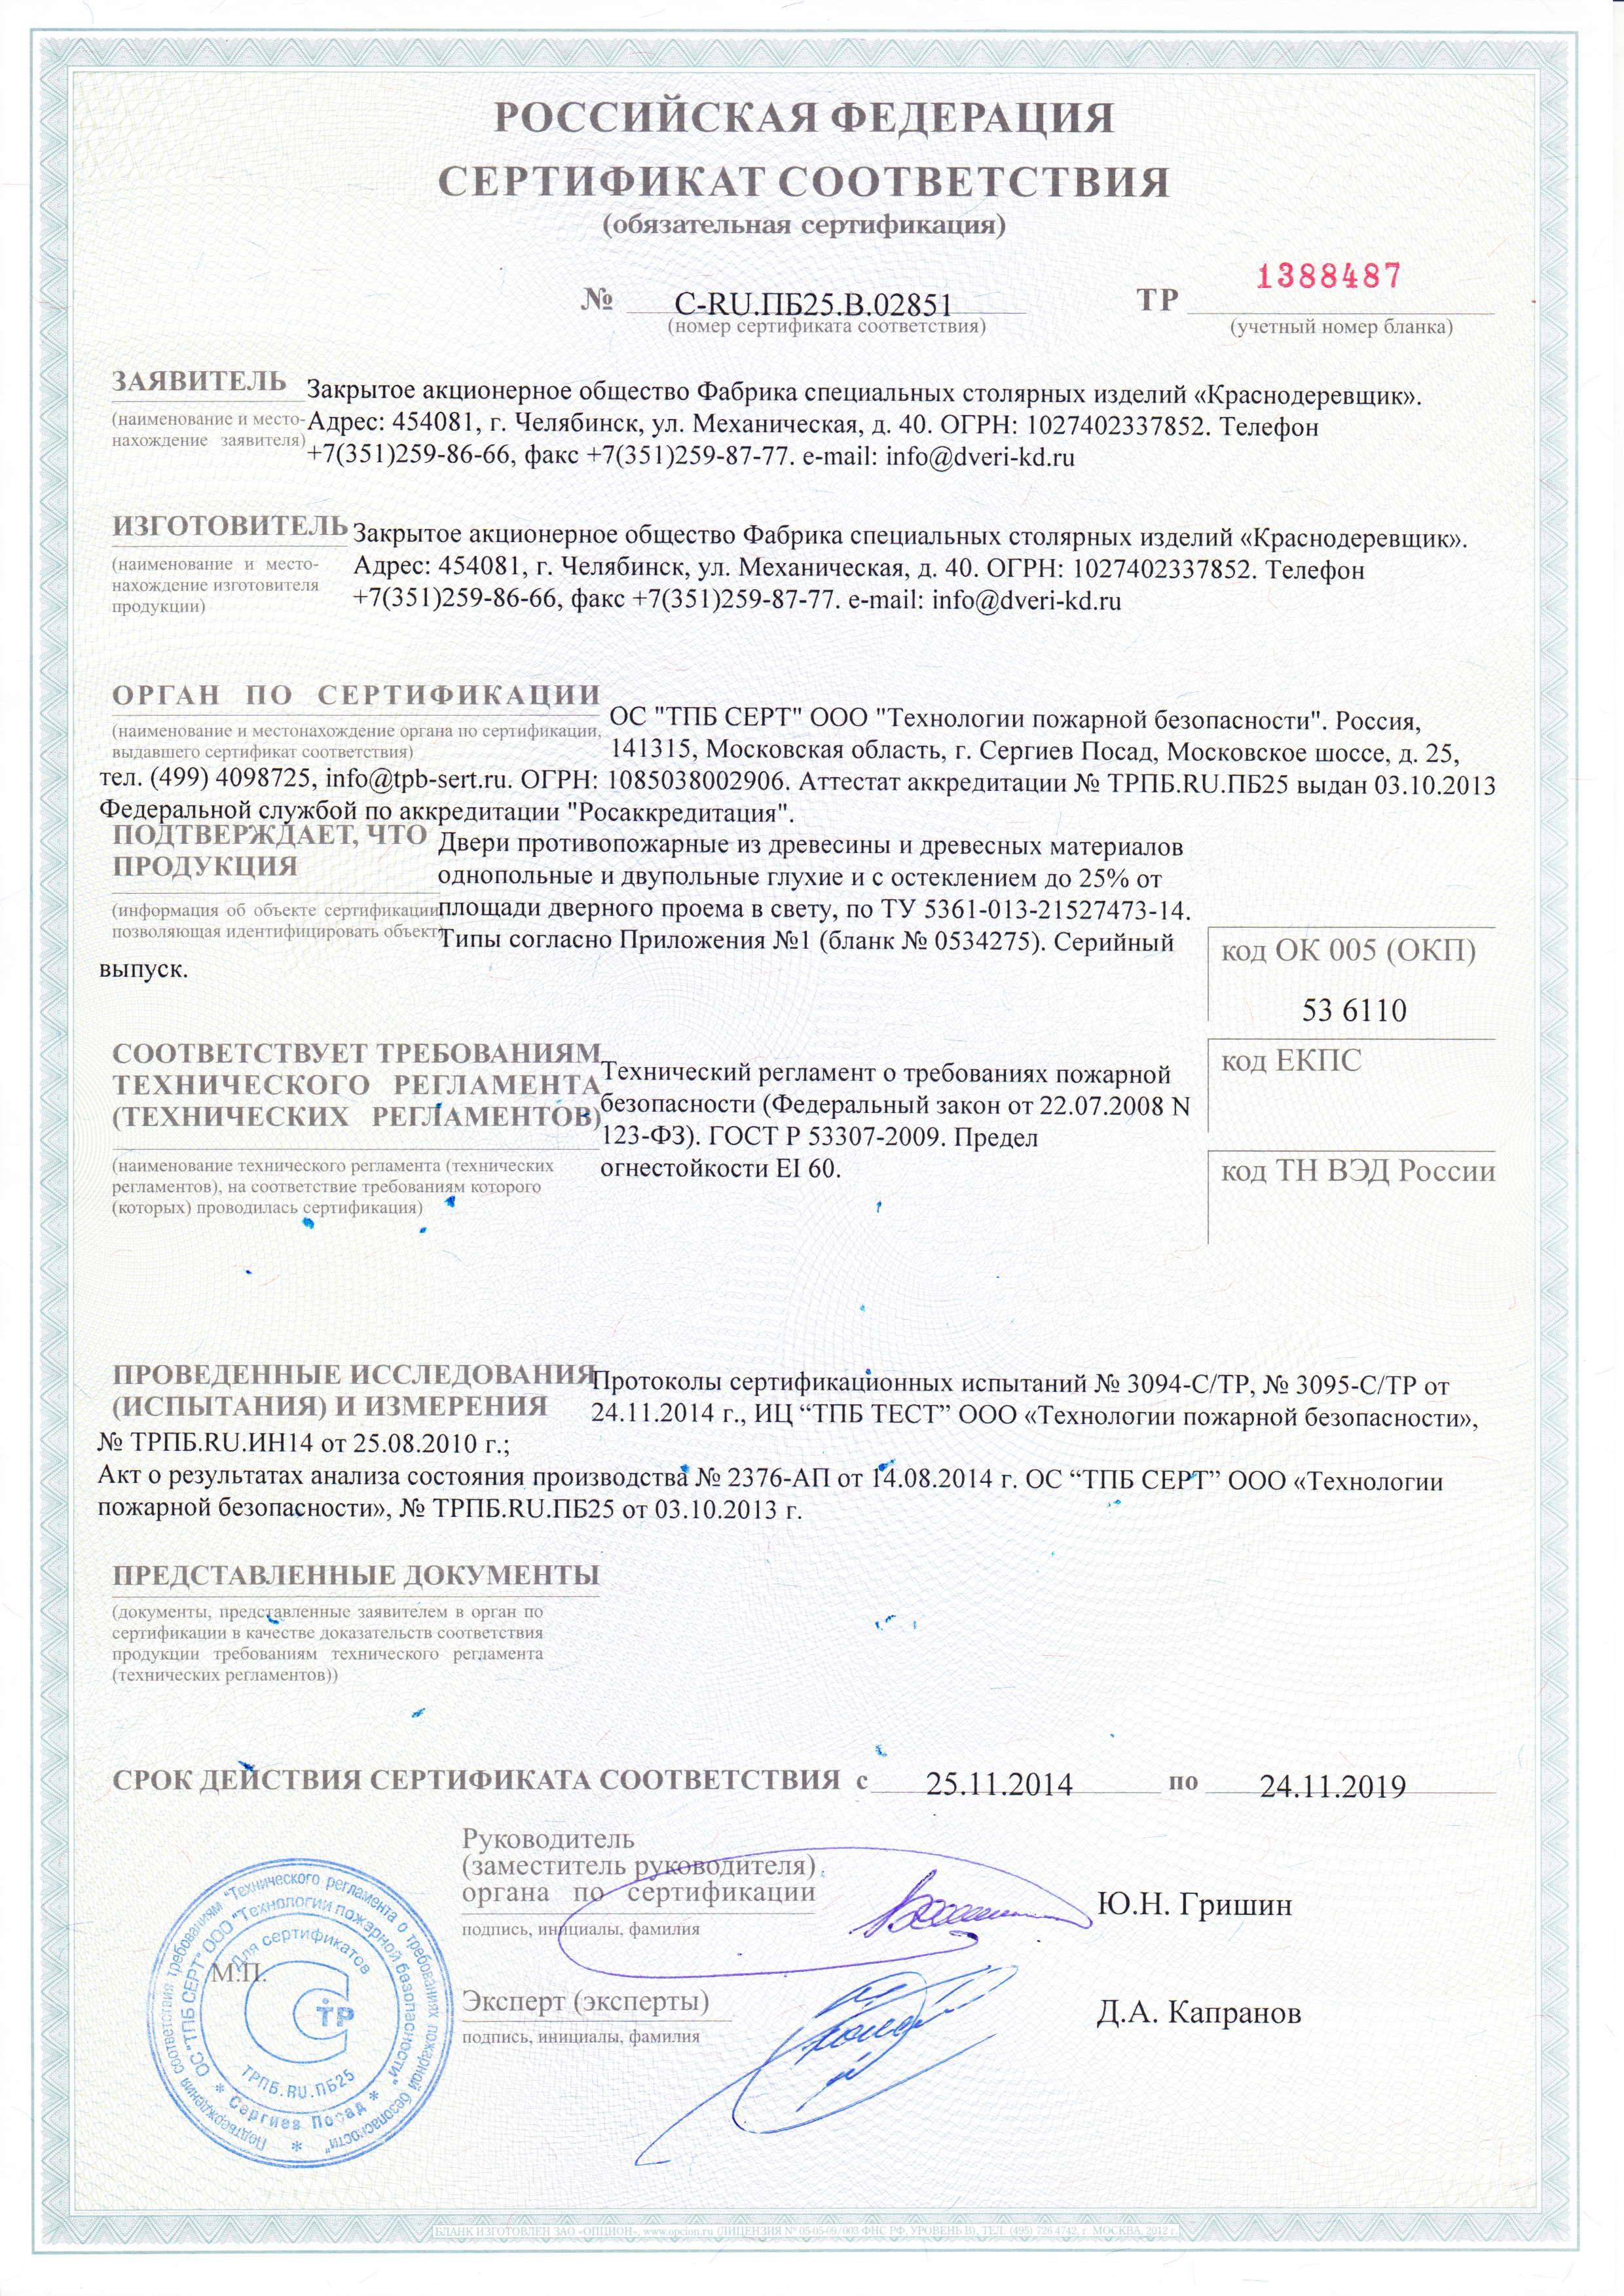 Сертификат на Предел огнестойкости EI 60